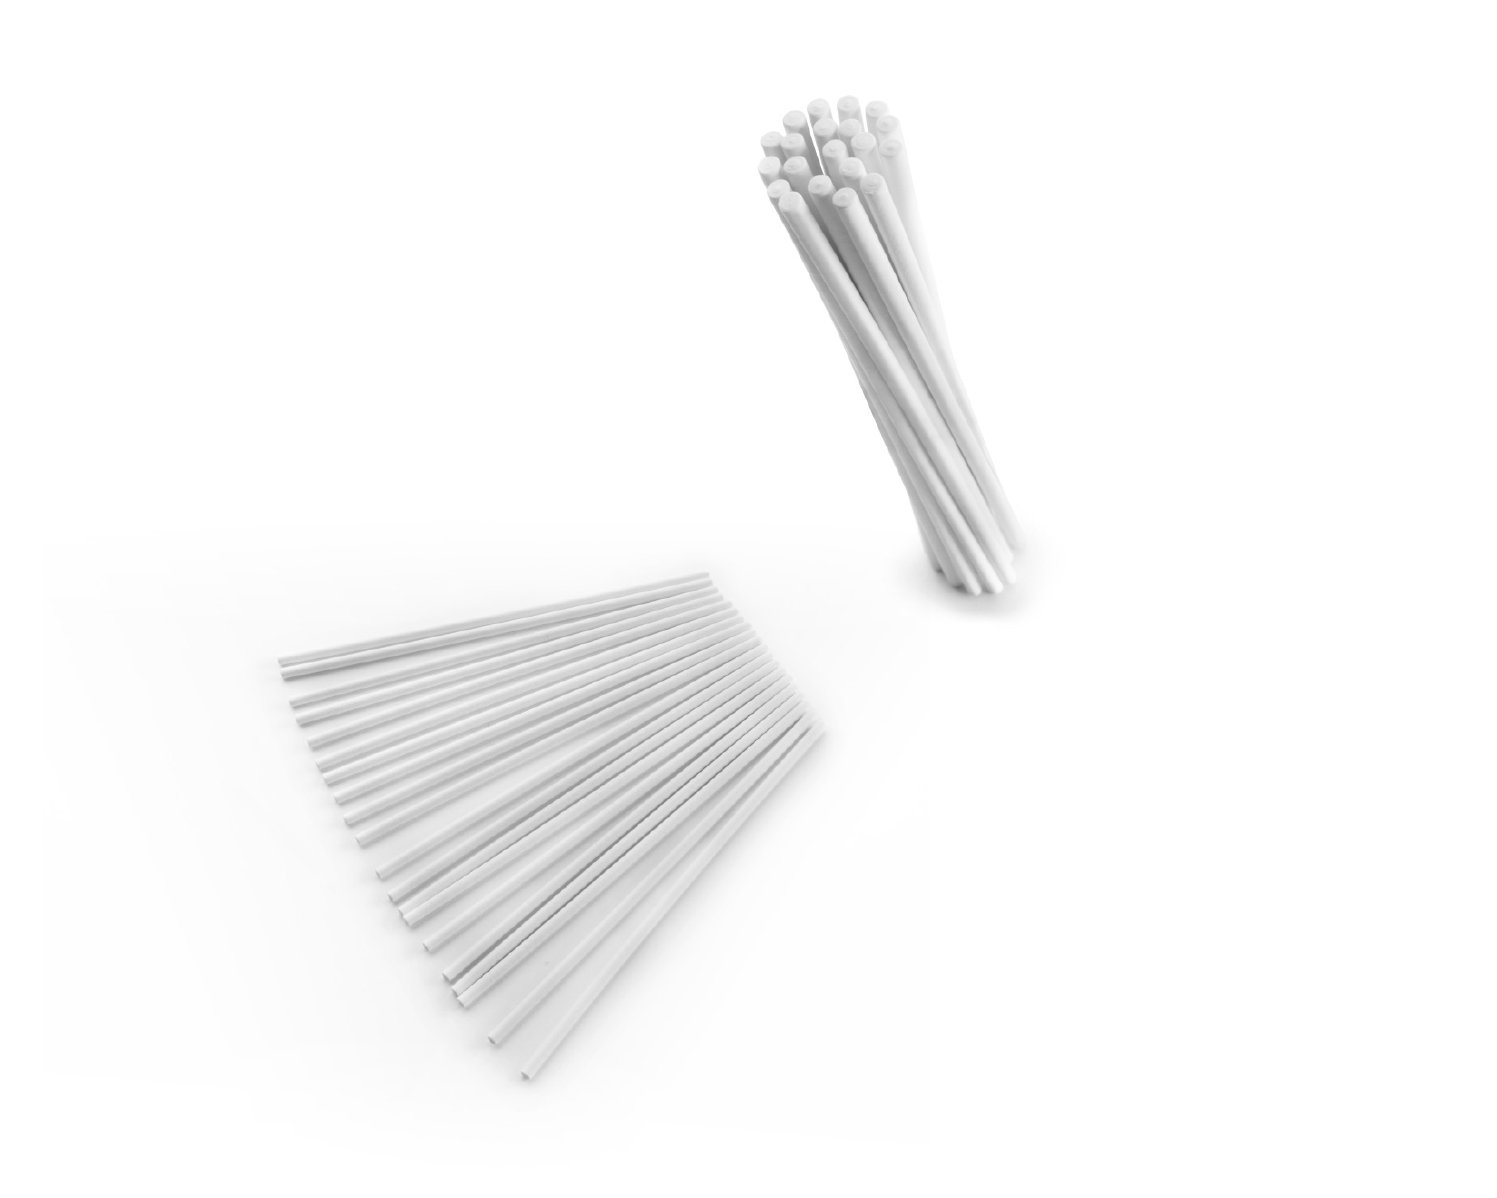 Ibili Cake Pop Sticks, White, 10 cm, 100-Piece 786510